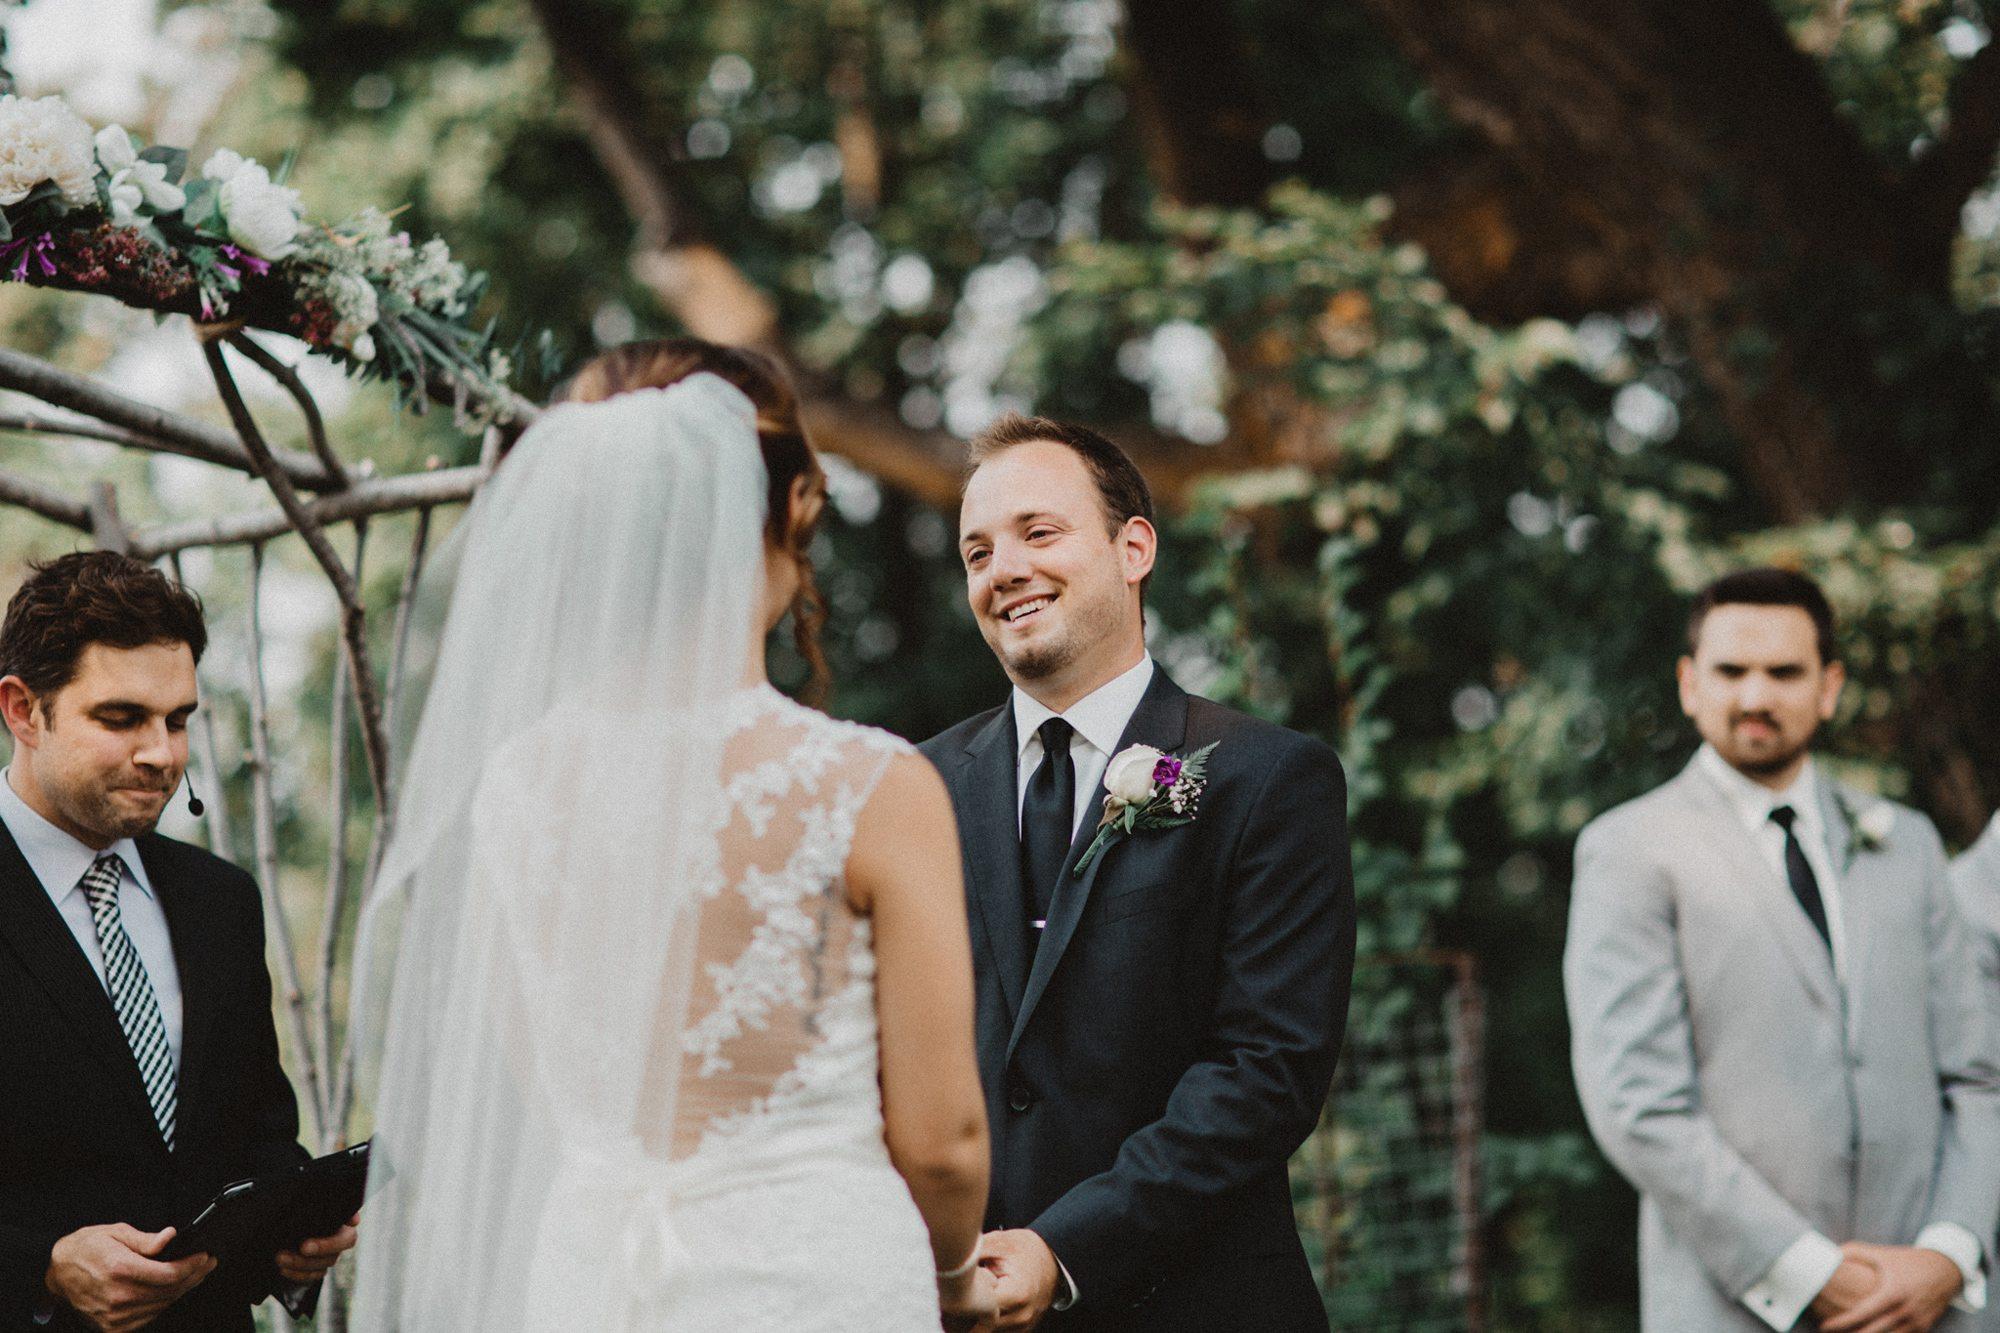 451-vernon-wedding-photographer